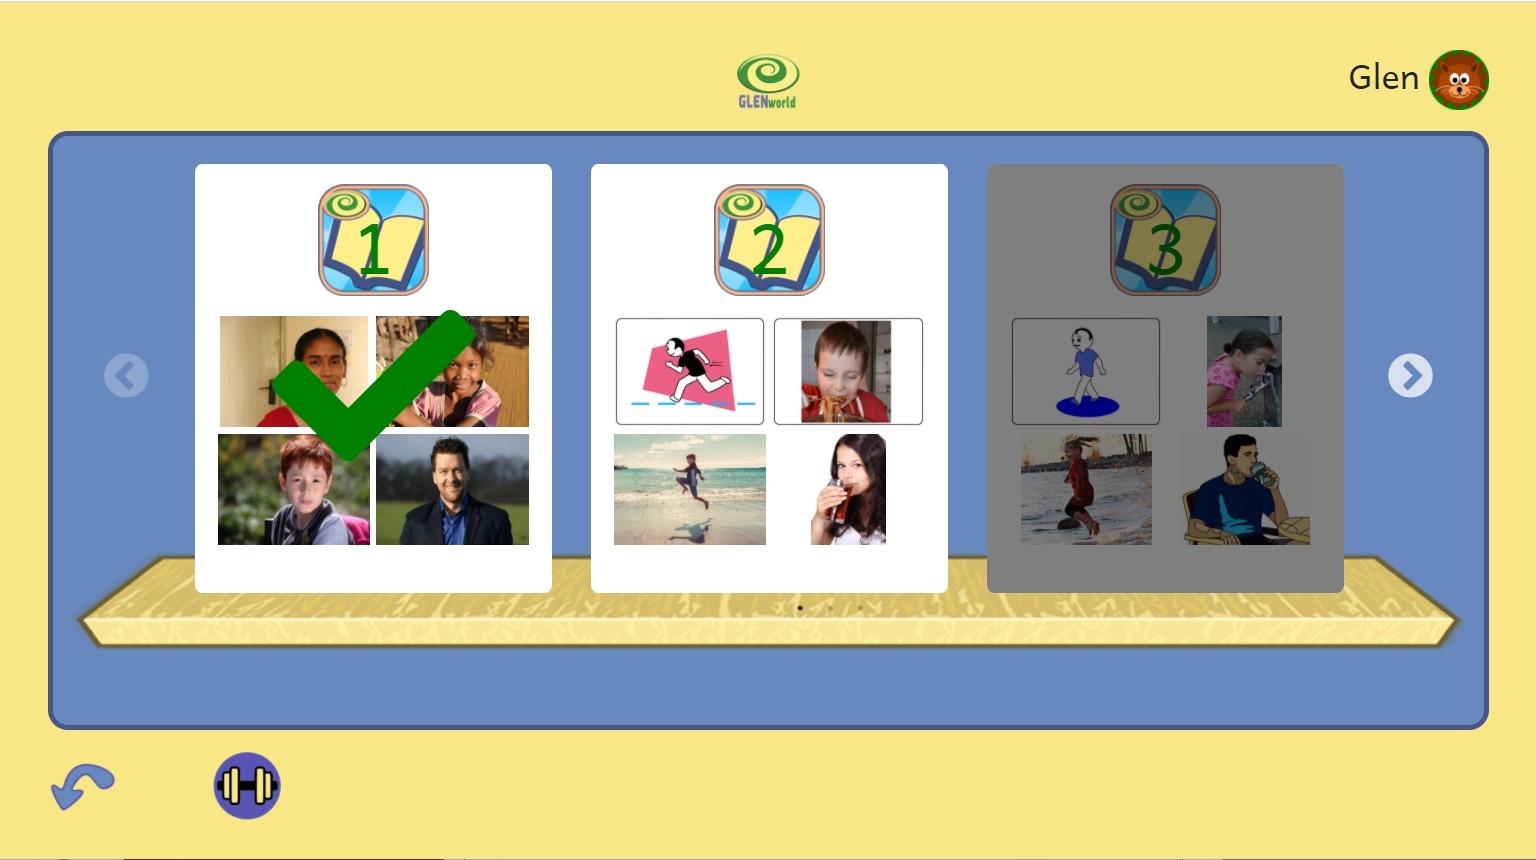 Screenshot 2020-10-24 184303